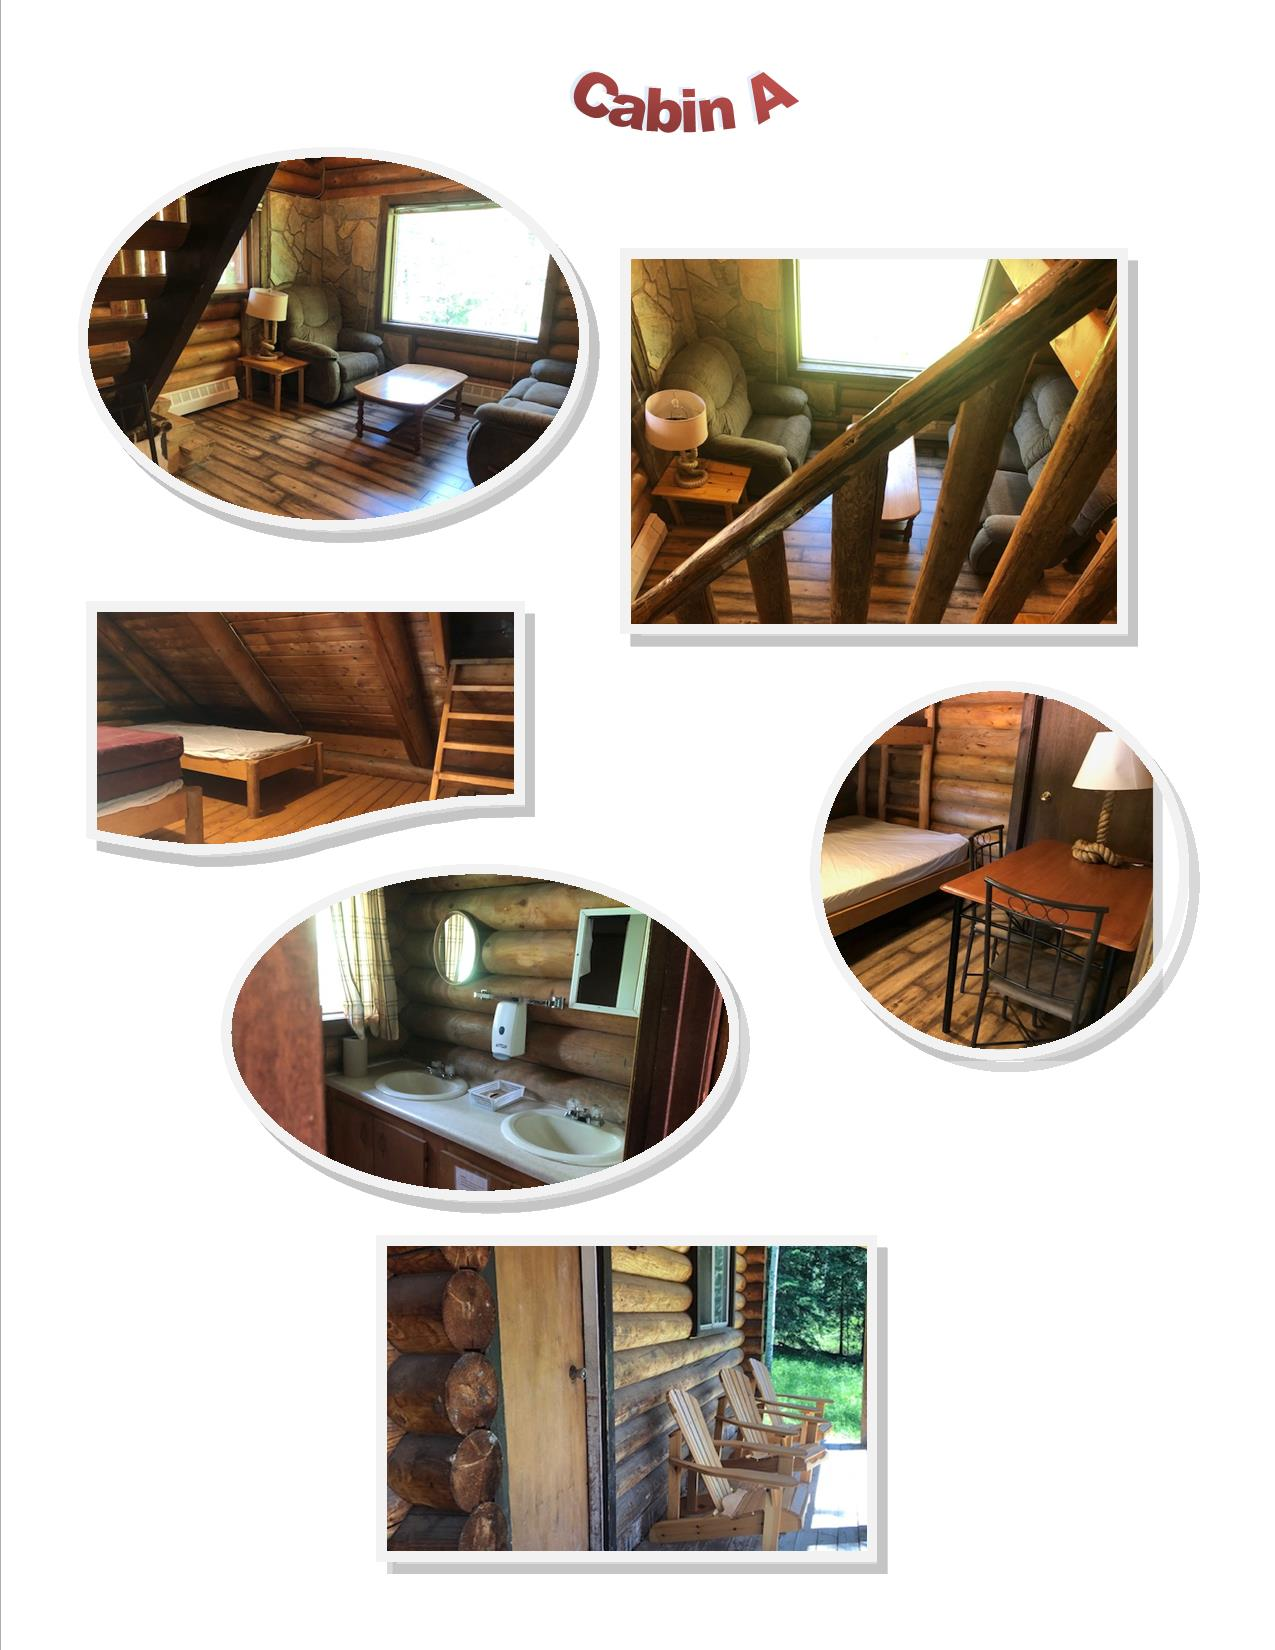 Cabin Rentals Cabin A